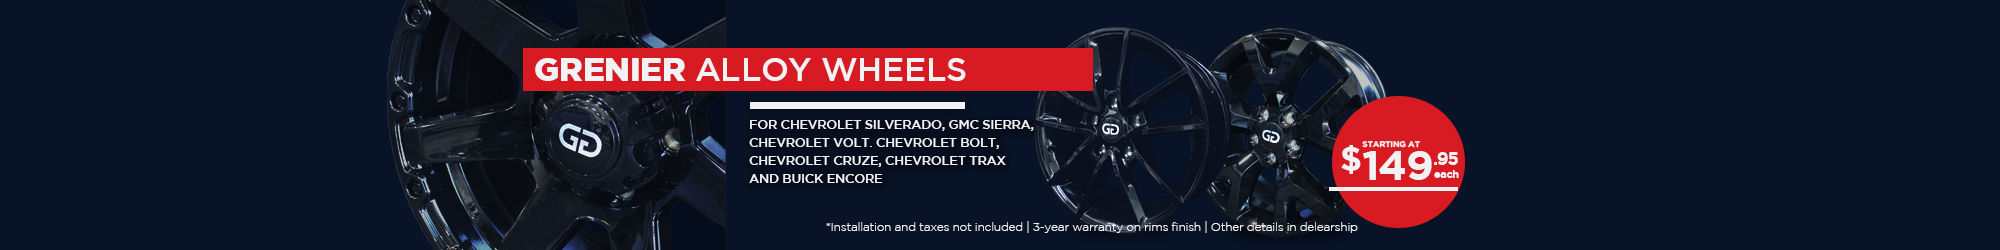 GRENIER alloy wheels - ALL (OCCASION)